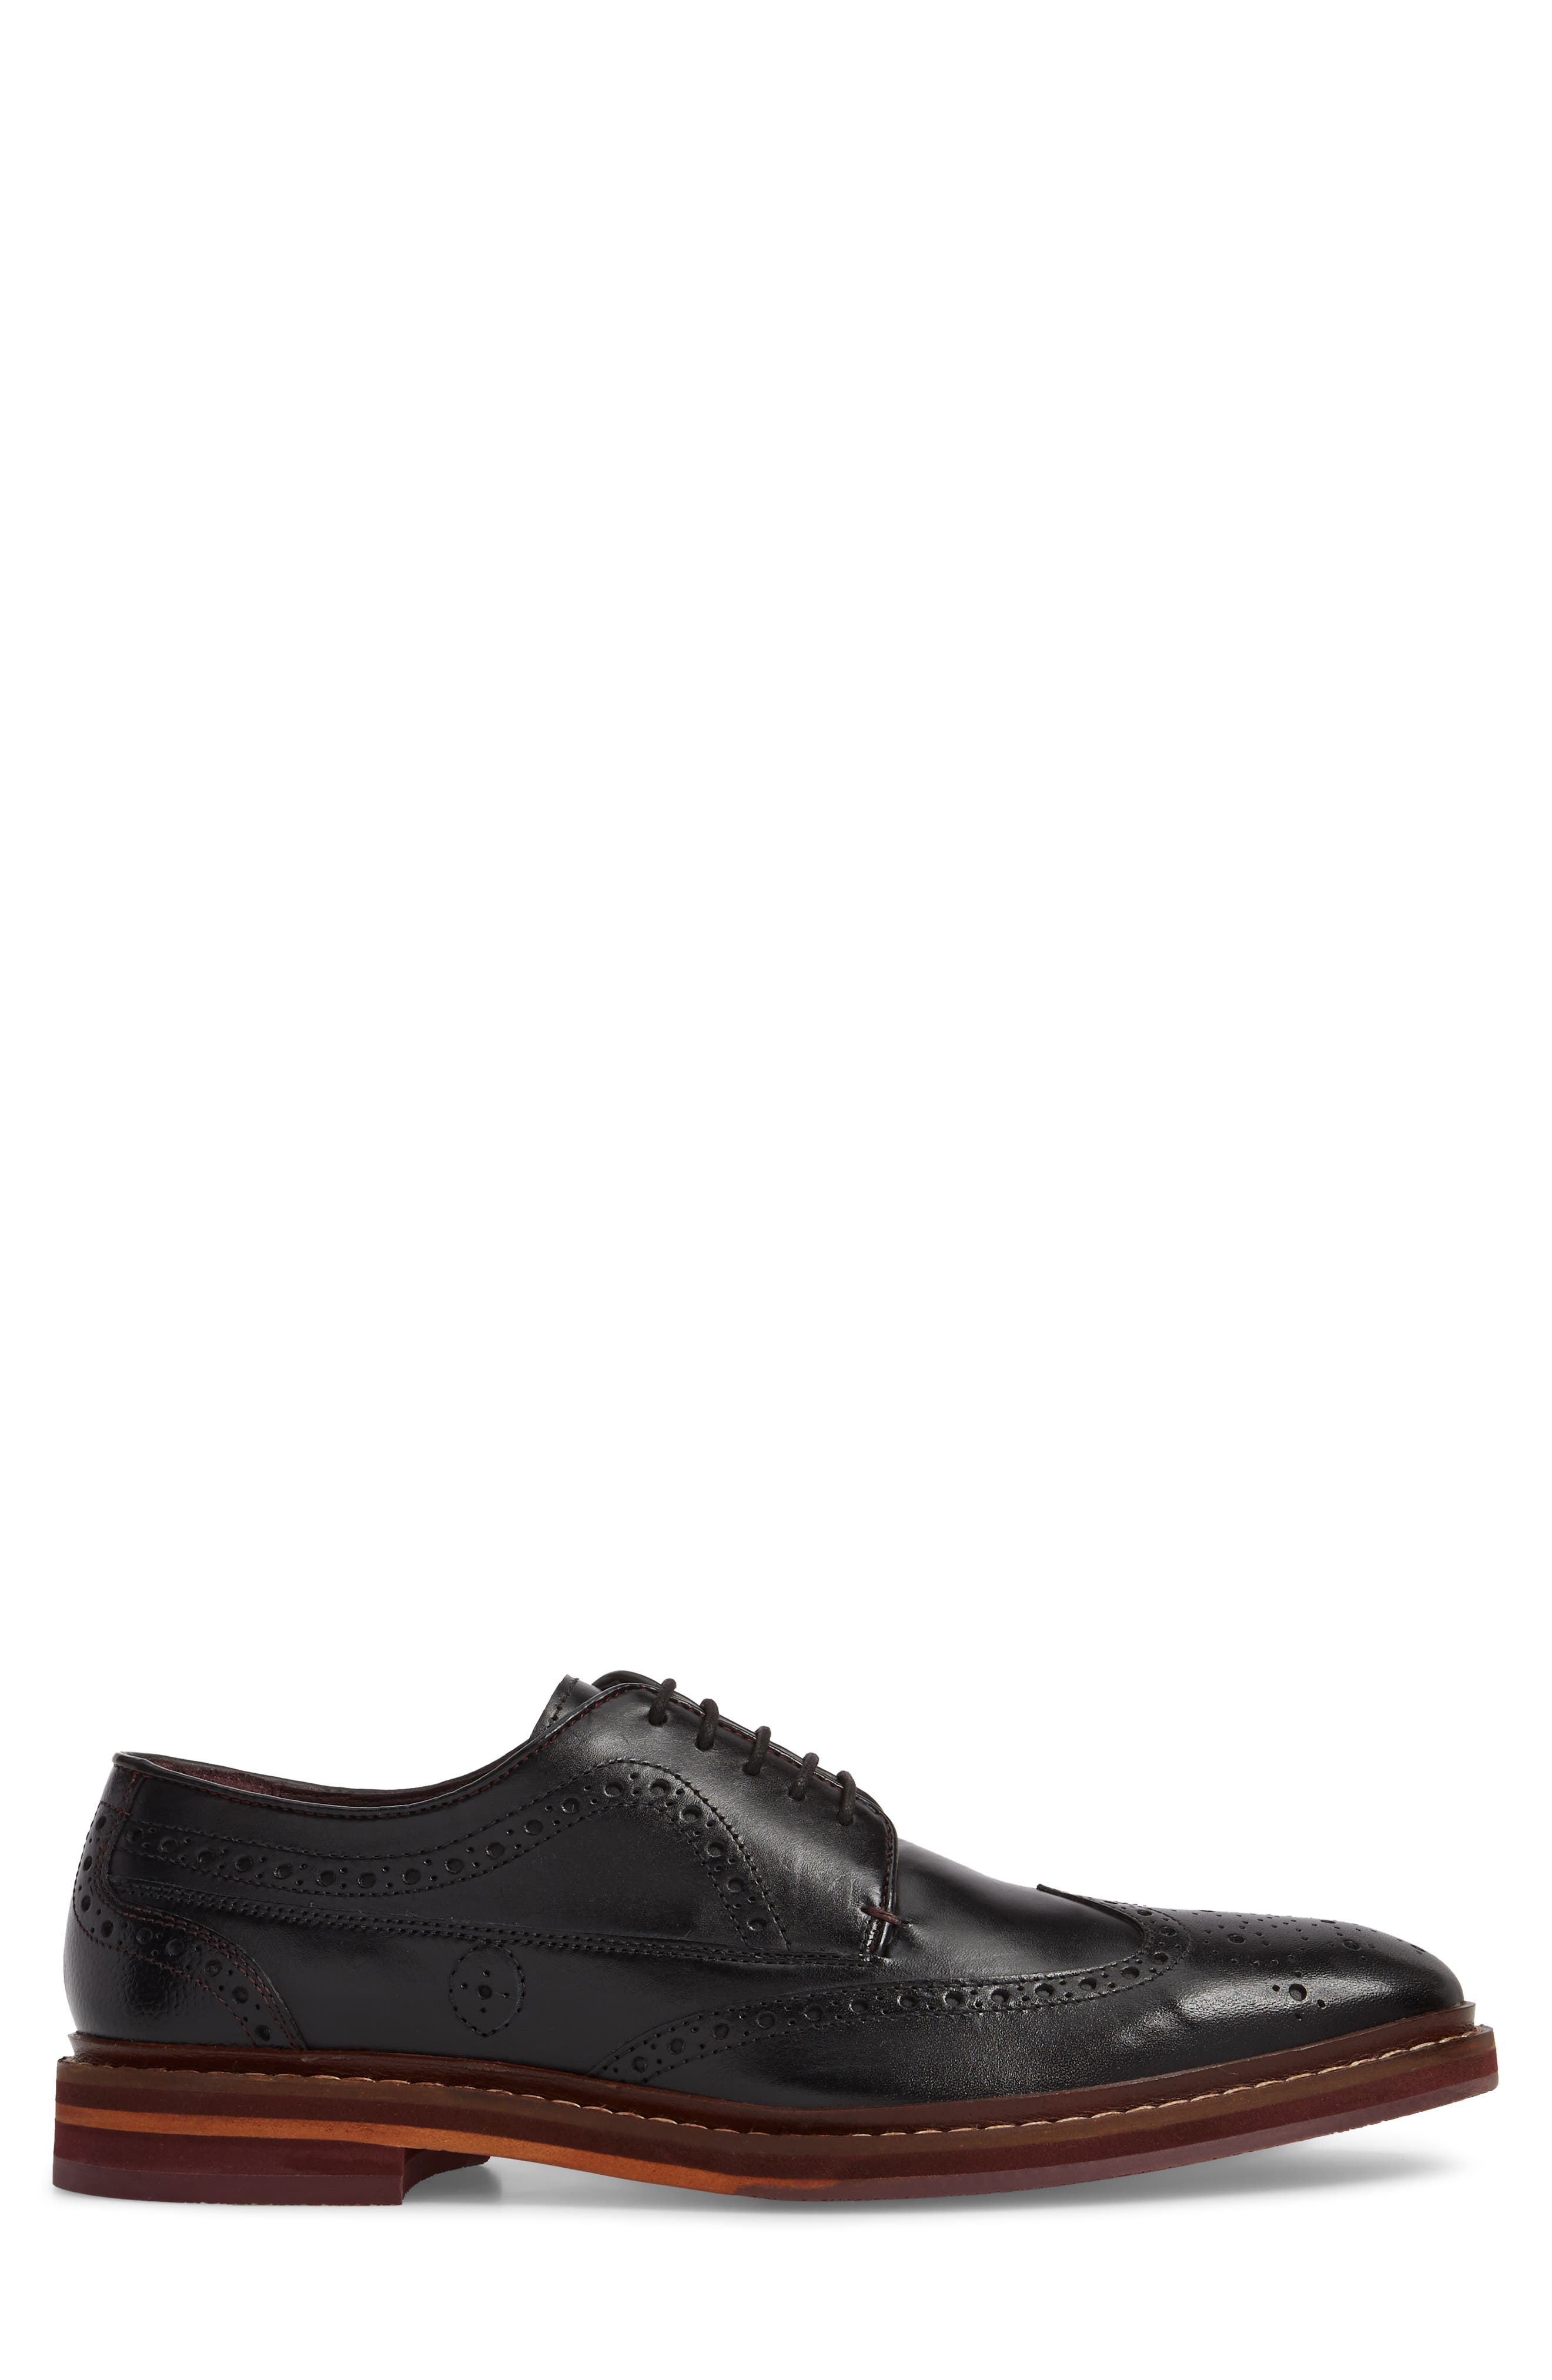 Gourdon Wingtip Derby,                             Alternate thumbnail 3, color,                             Black Leather